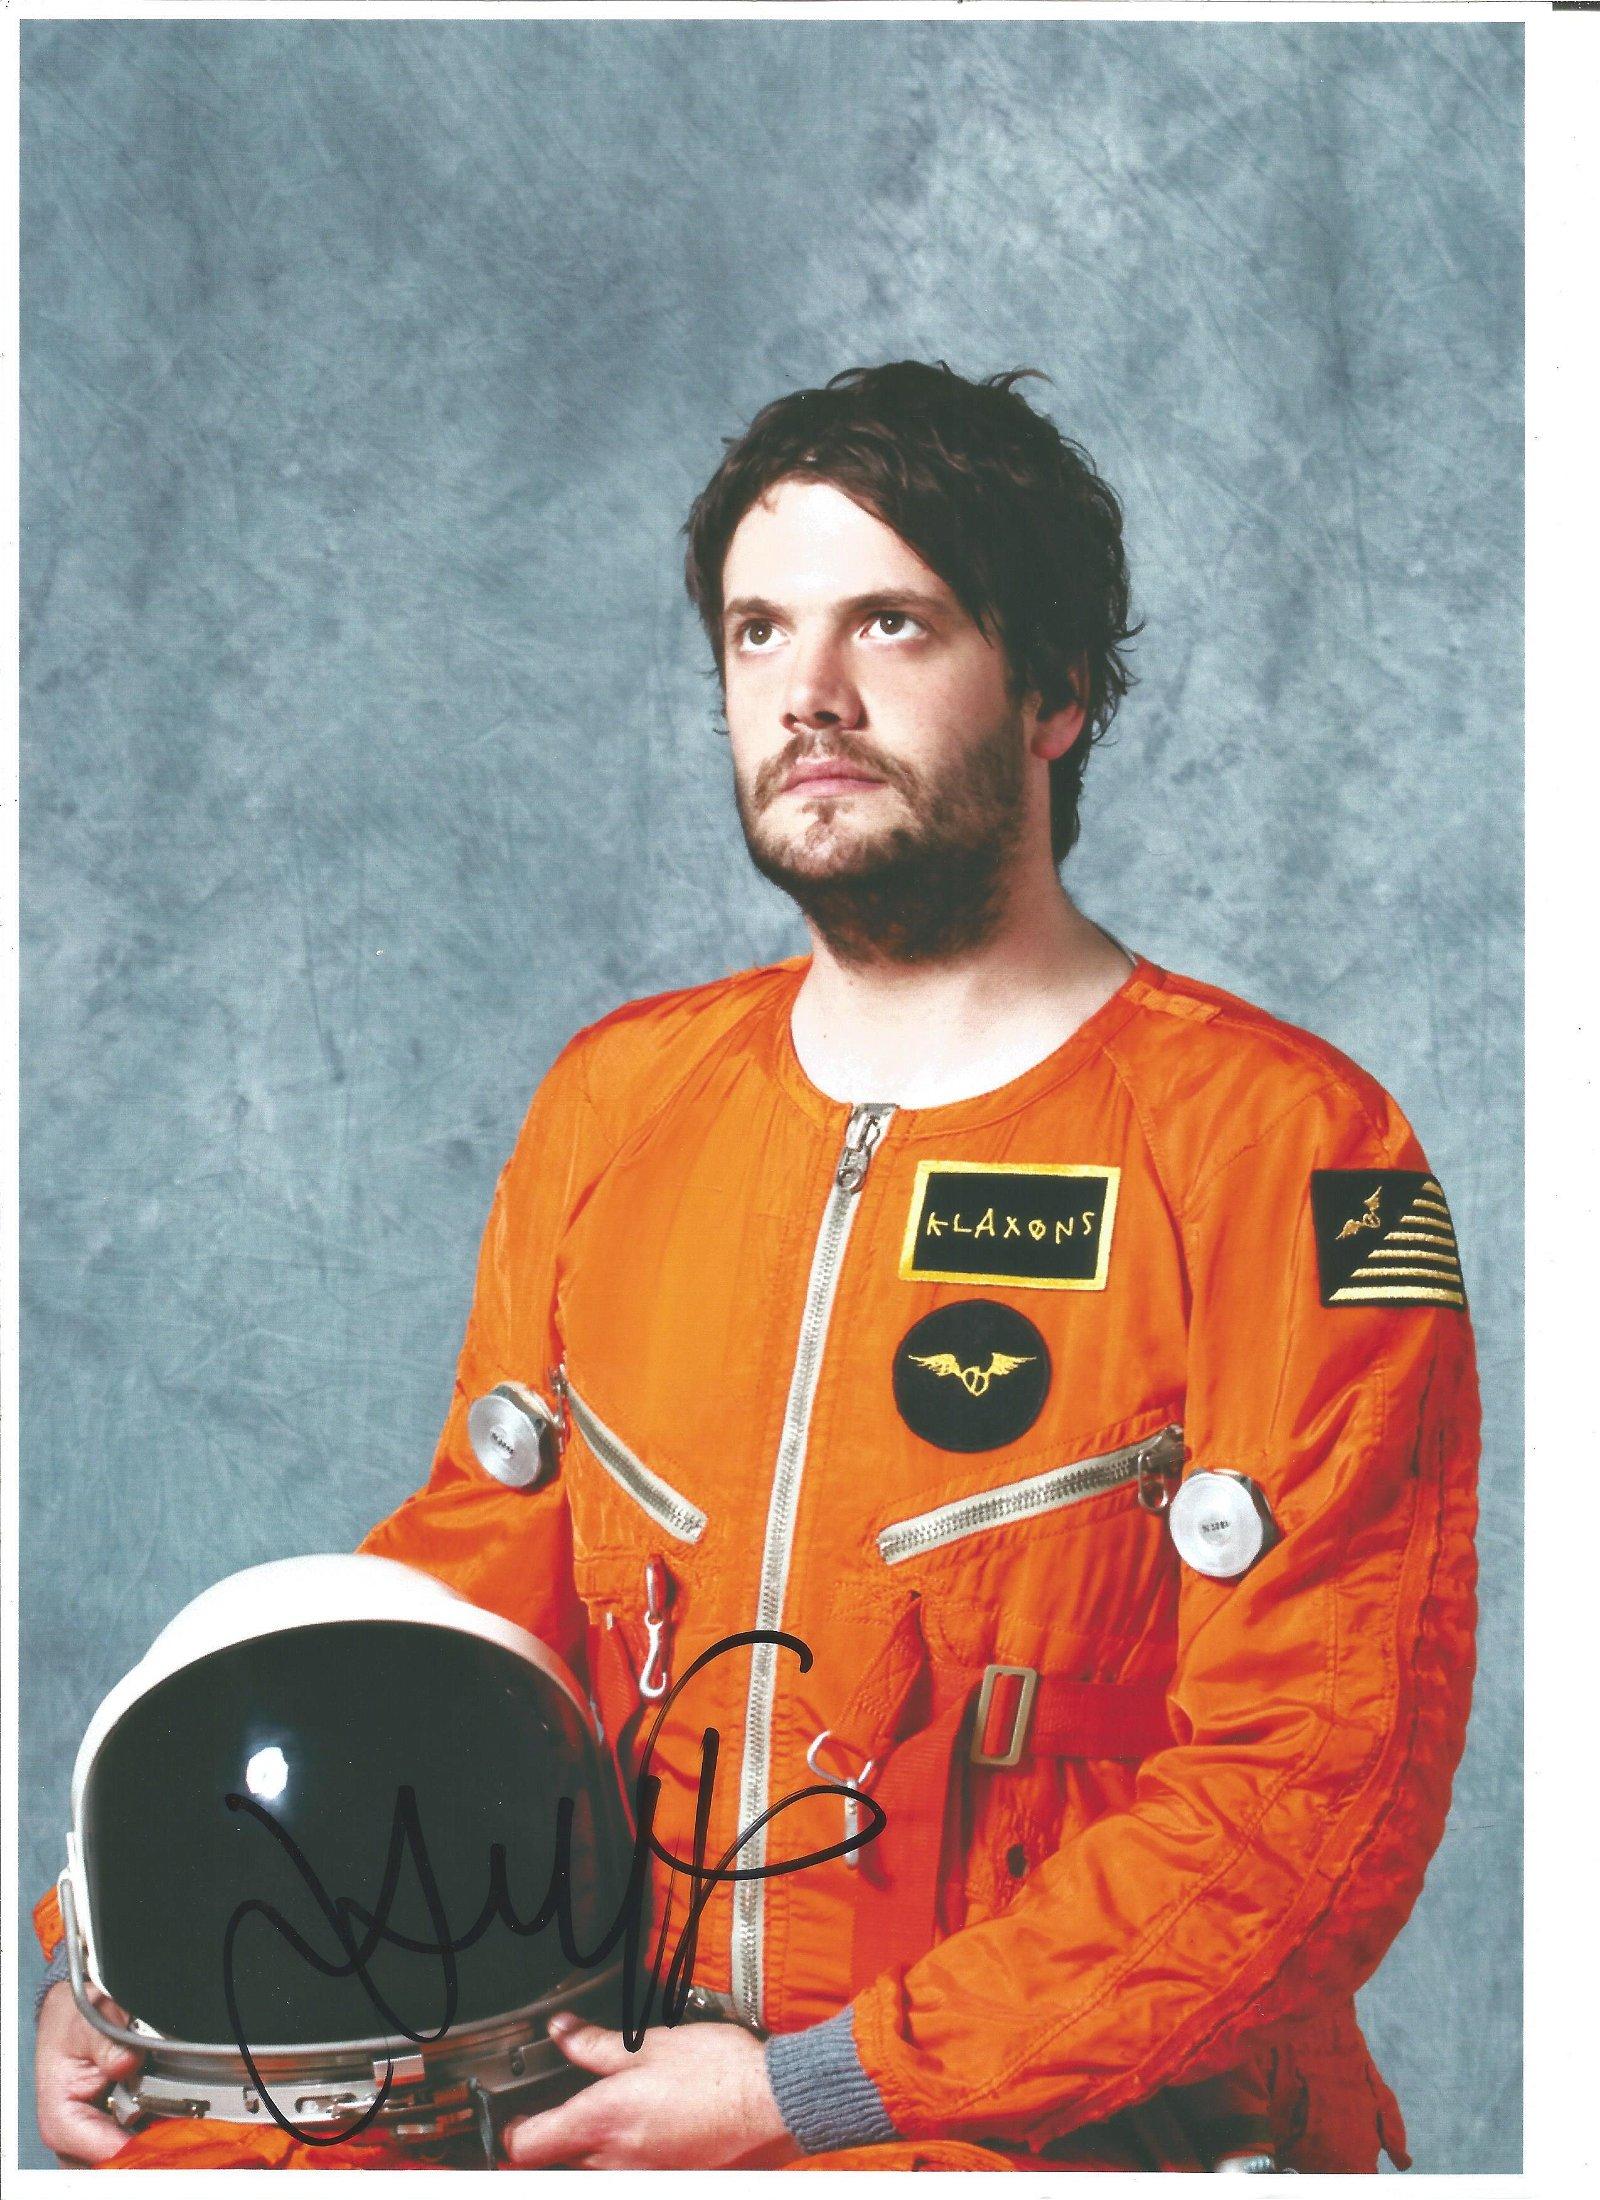 Jamie Reynolds Klaxons Singer Signed 8x12 Photo. Good